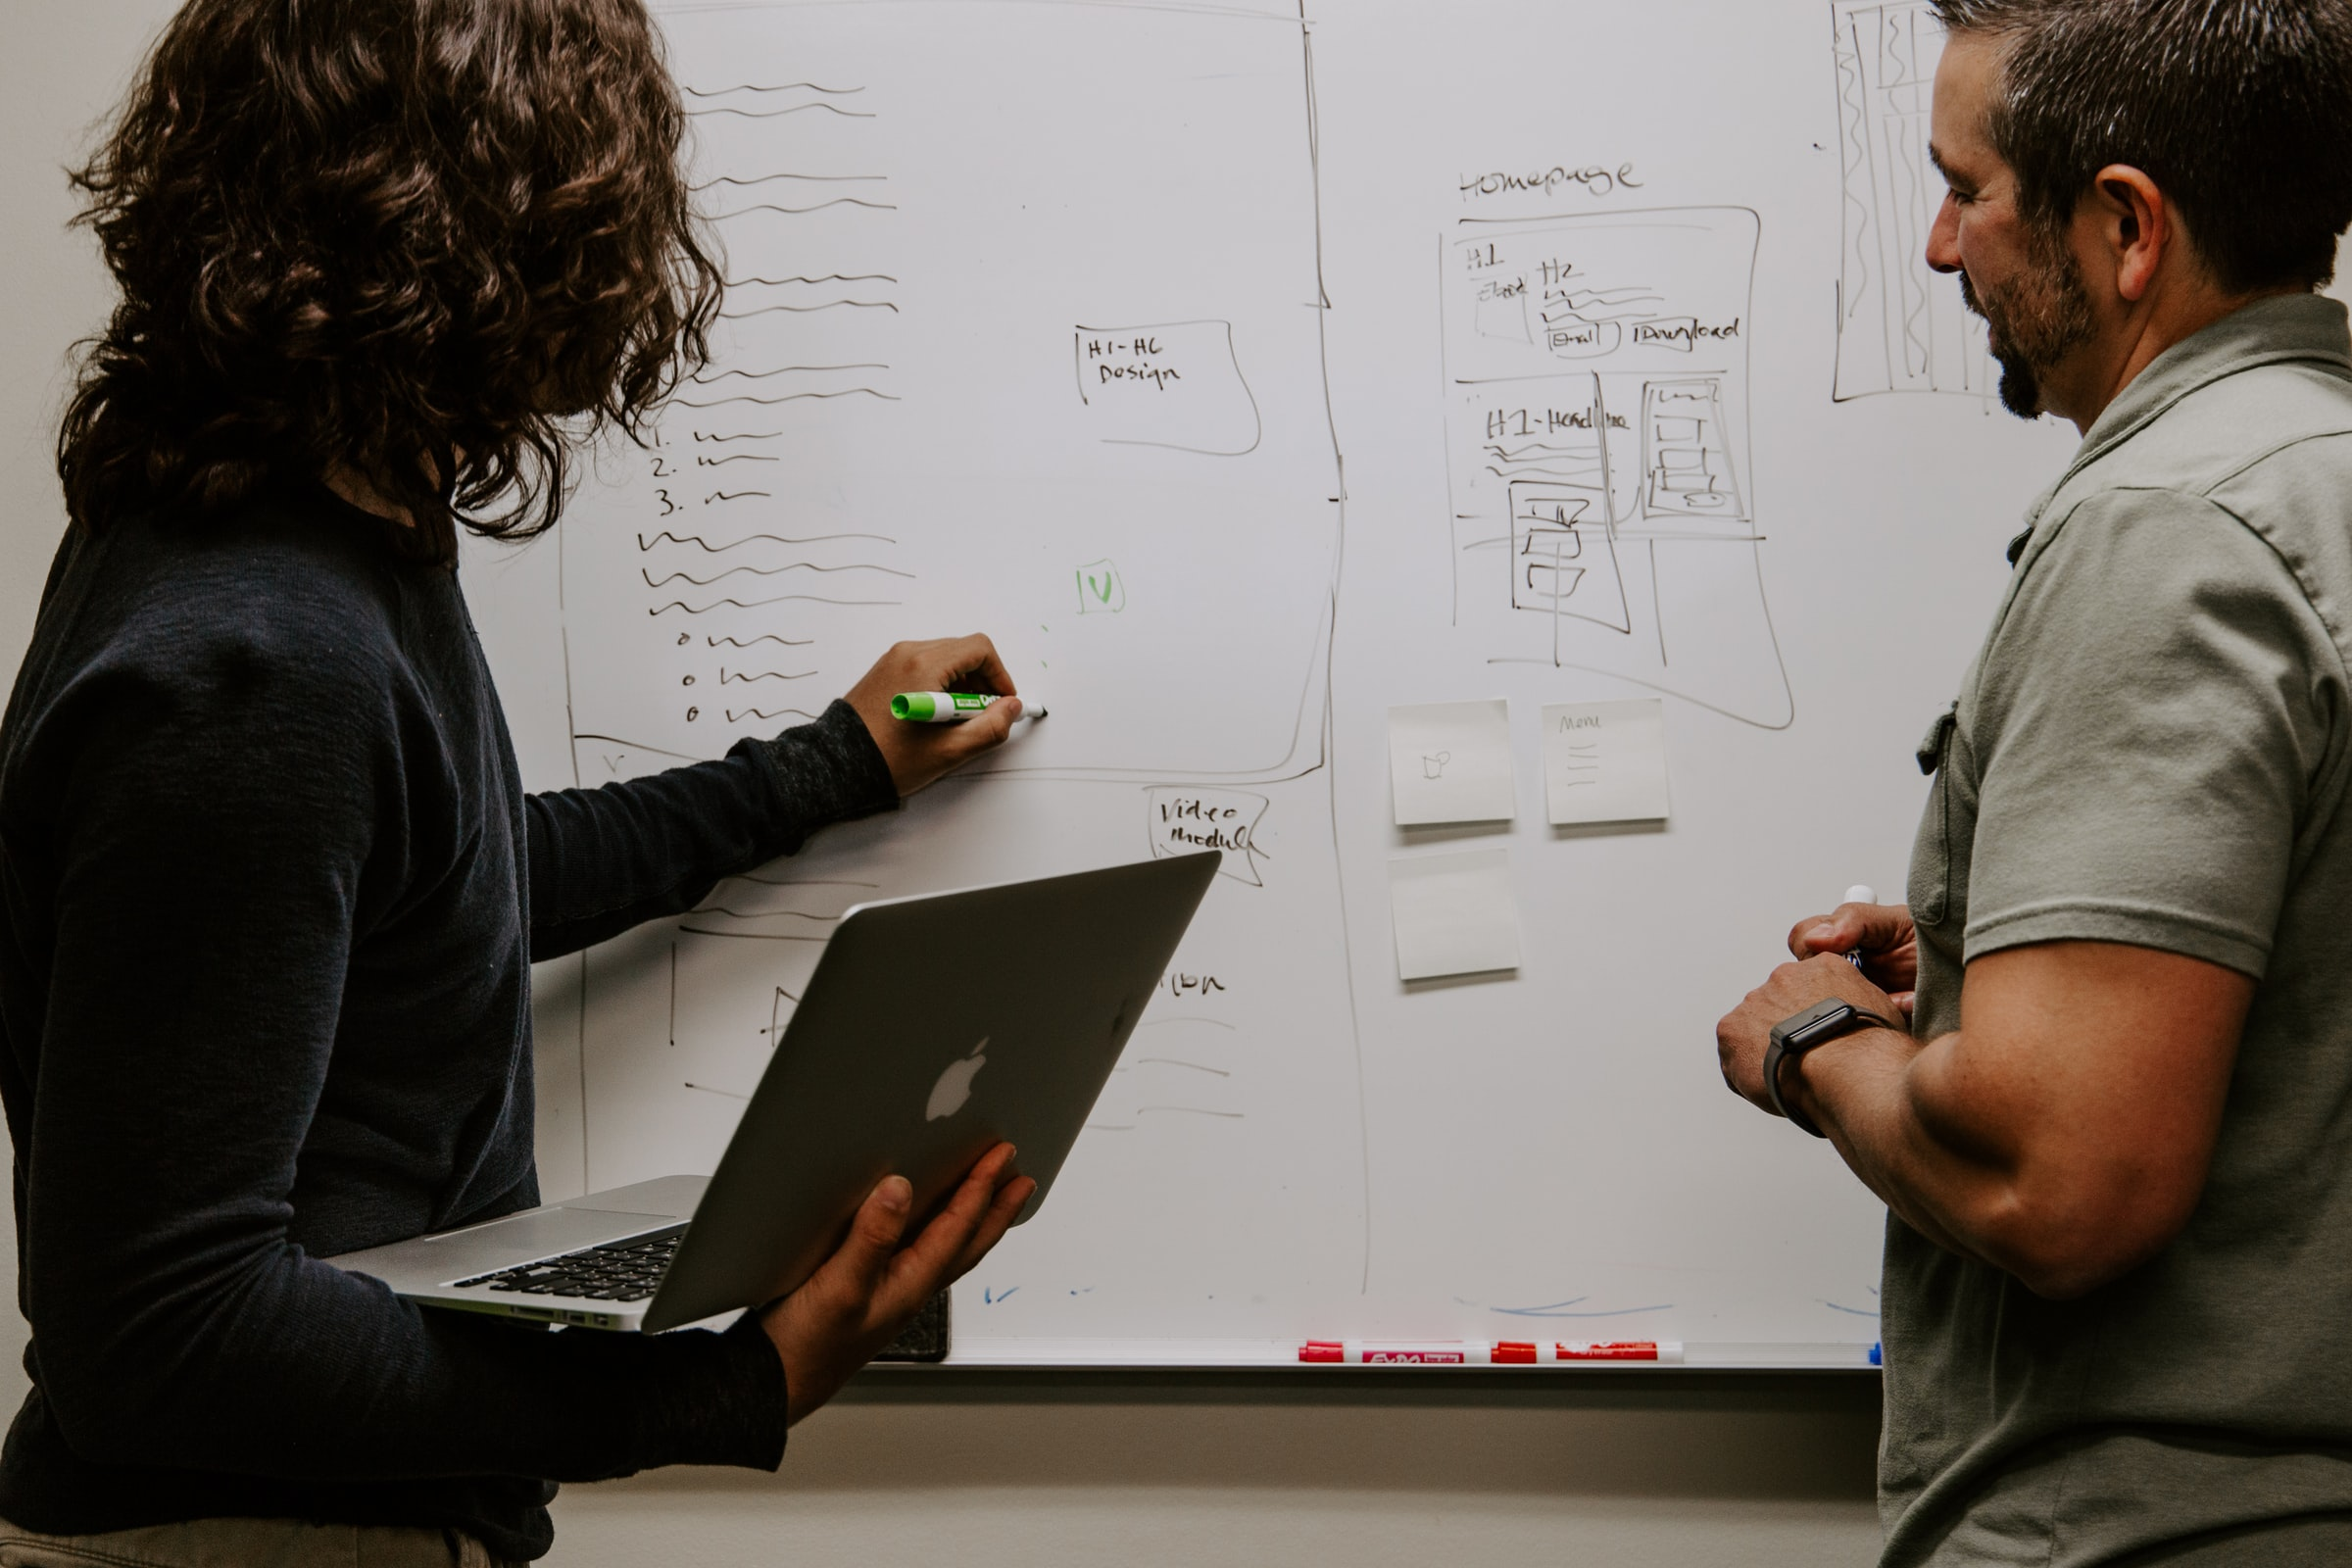 två manliga kollegor skissar på en whiteboard